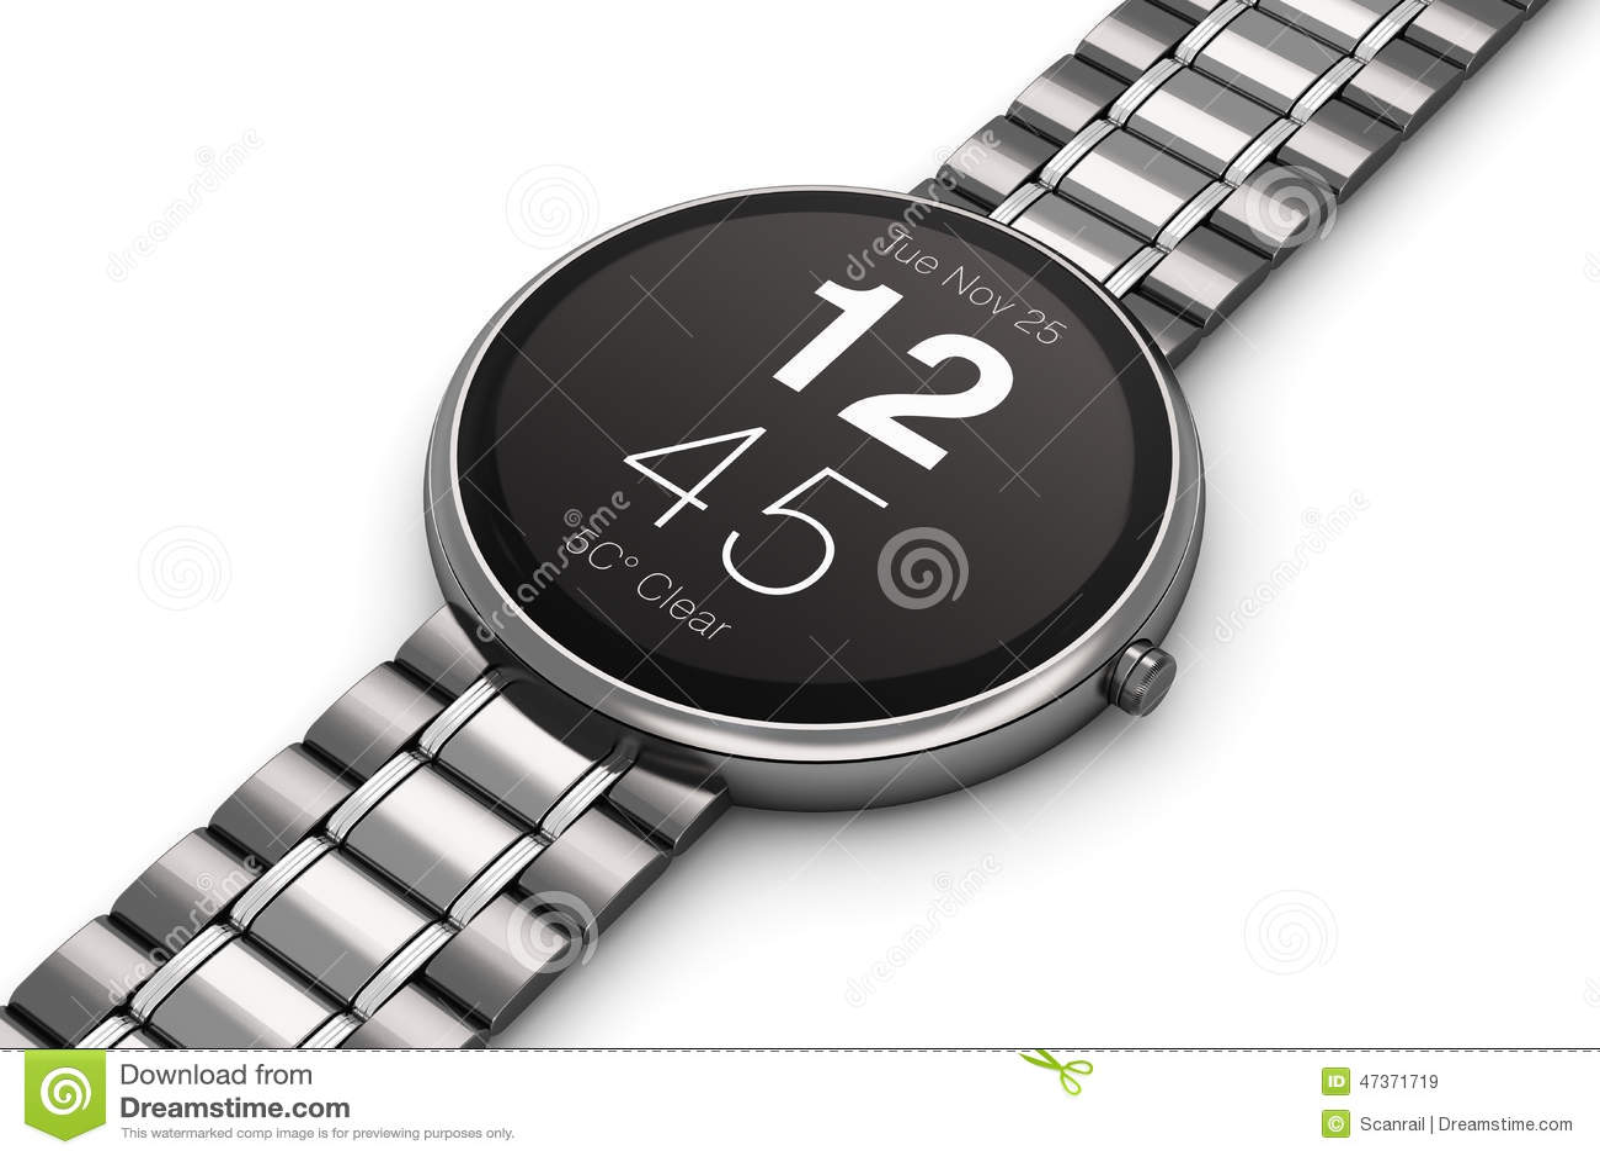 stainless steel luxury smartwatch stock illustration image 47371719. Black Bedroom Furniture Sets. Home Design Ideas